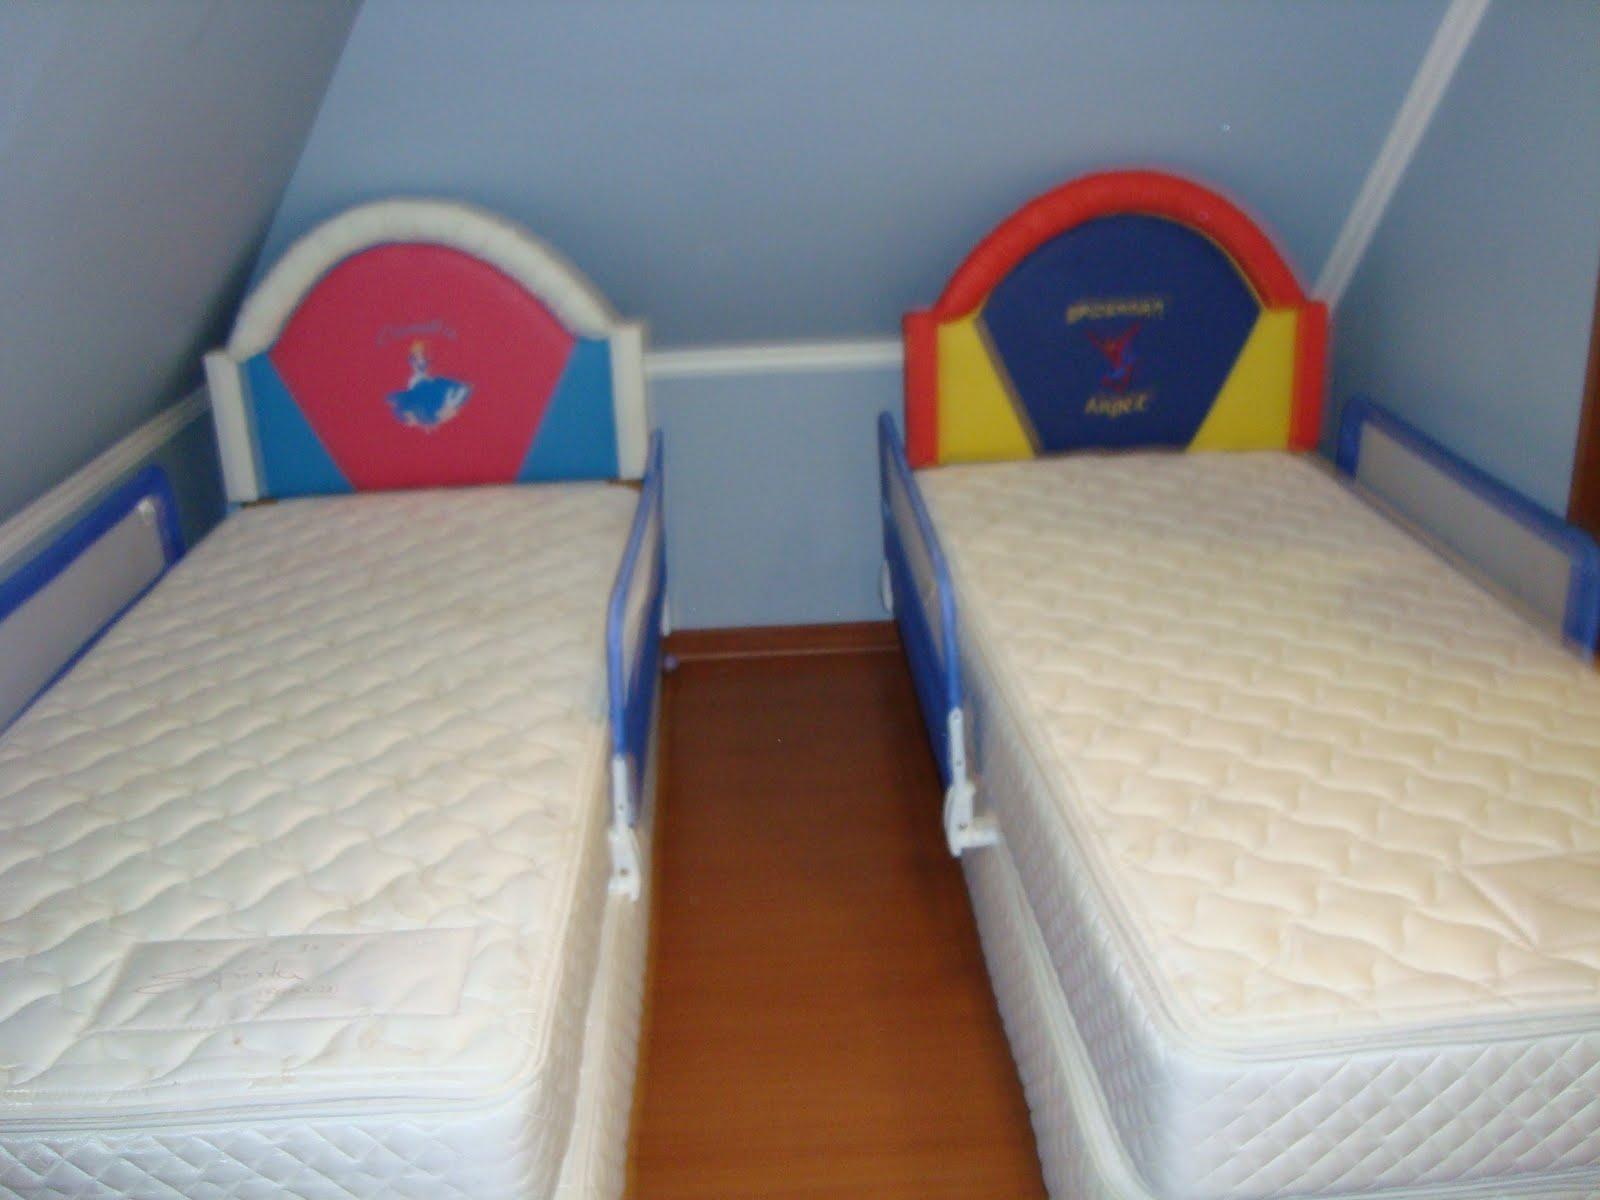 Sillones baules camas y respaldos infantiles for Sillon cama chile